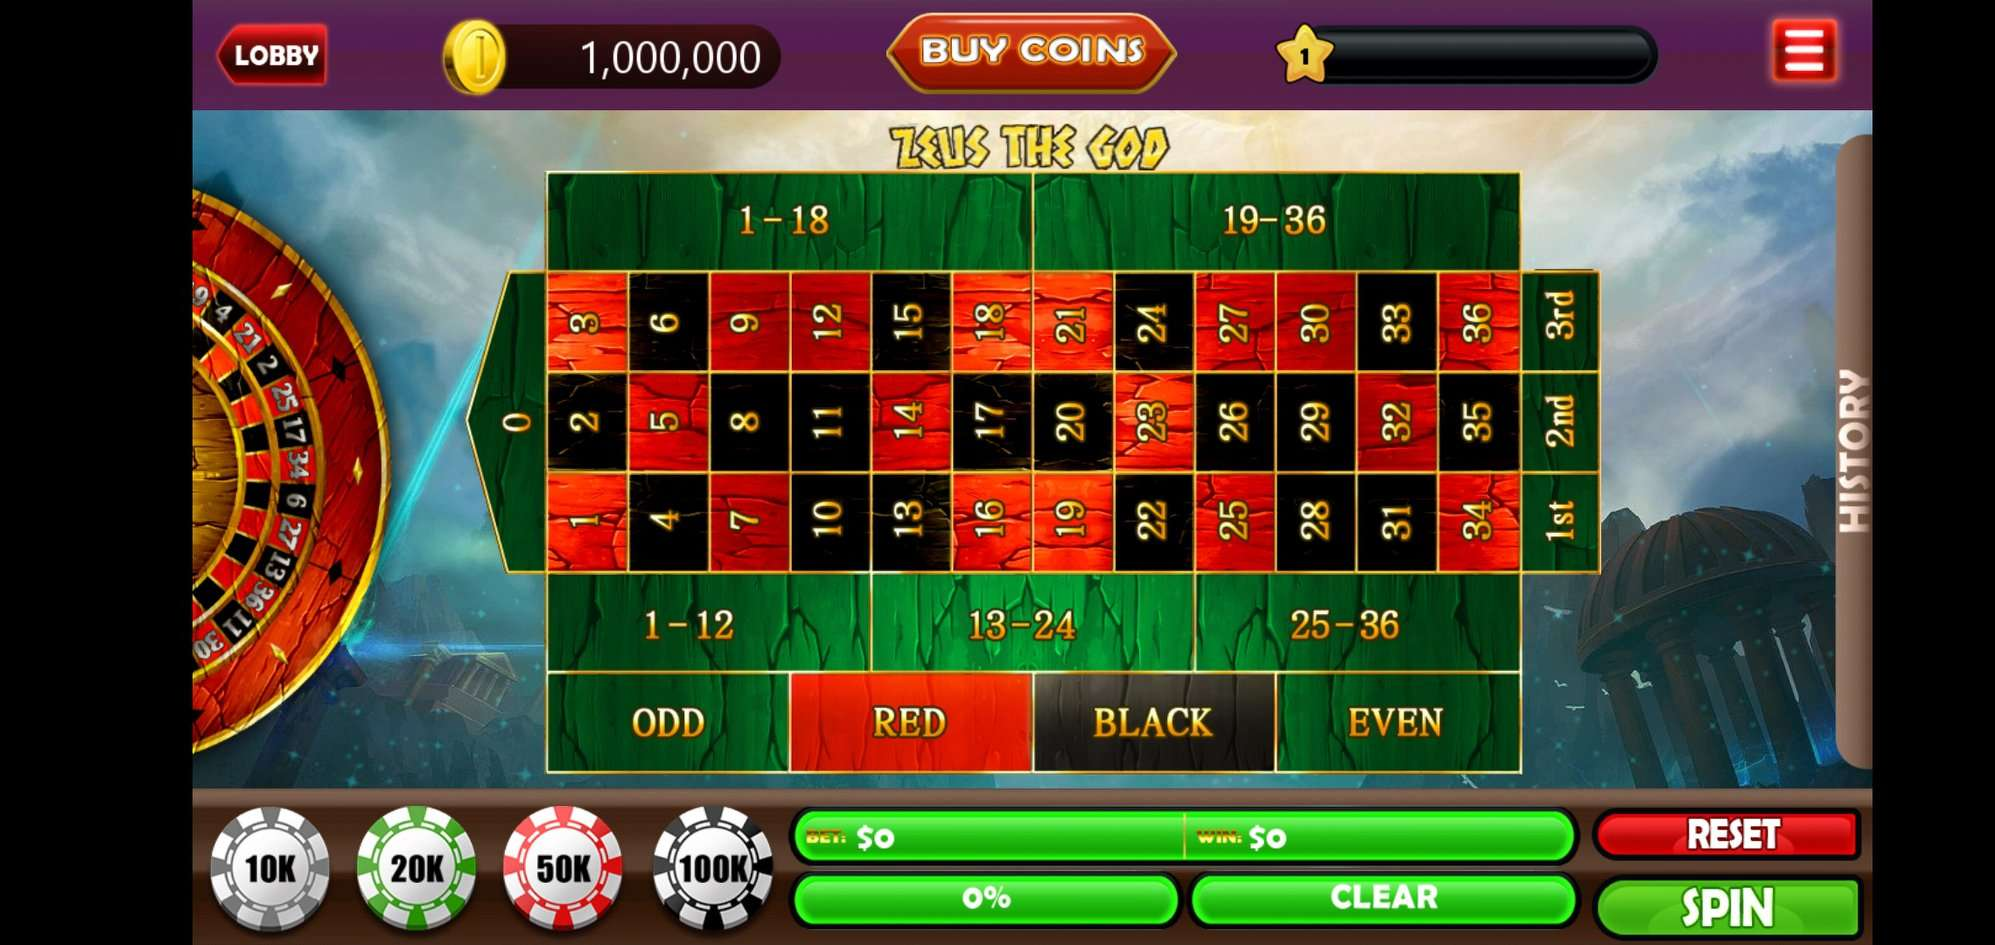 4 in 1 Slots, Blackjack, Roulette, Baccarat